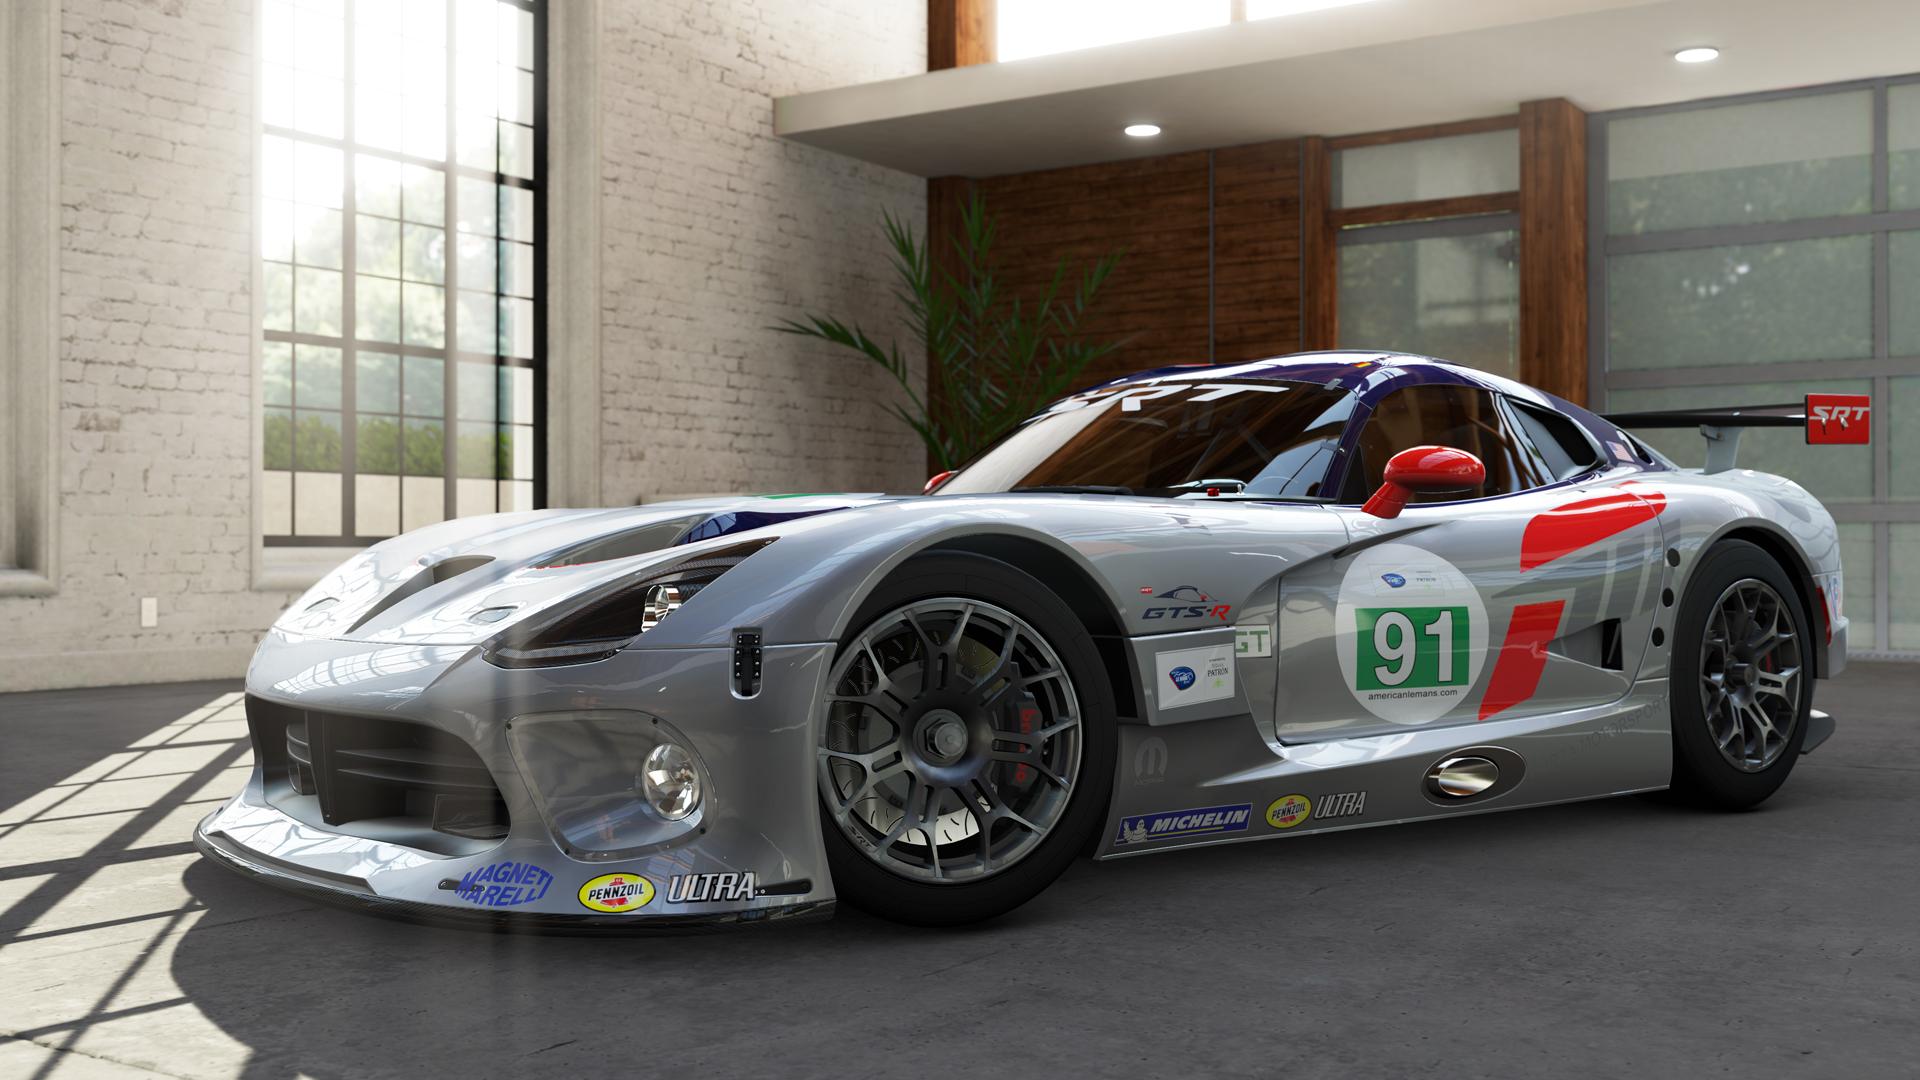 2017 Viper 91 Srt Motorsport Gts R